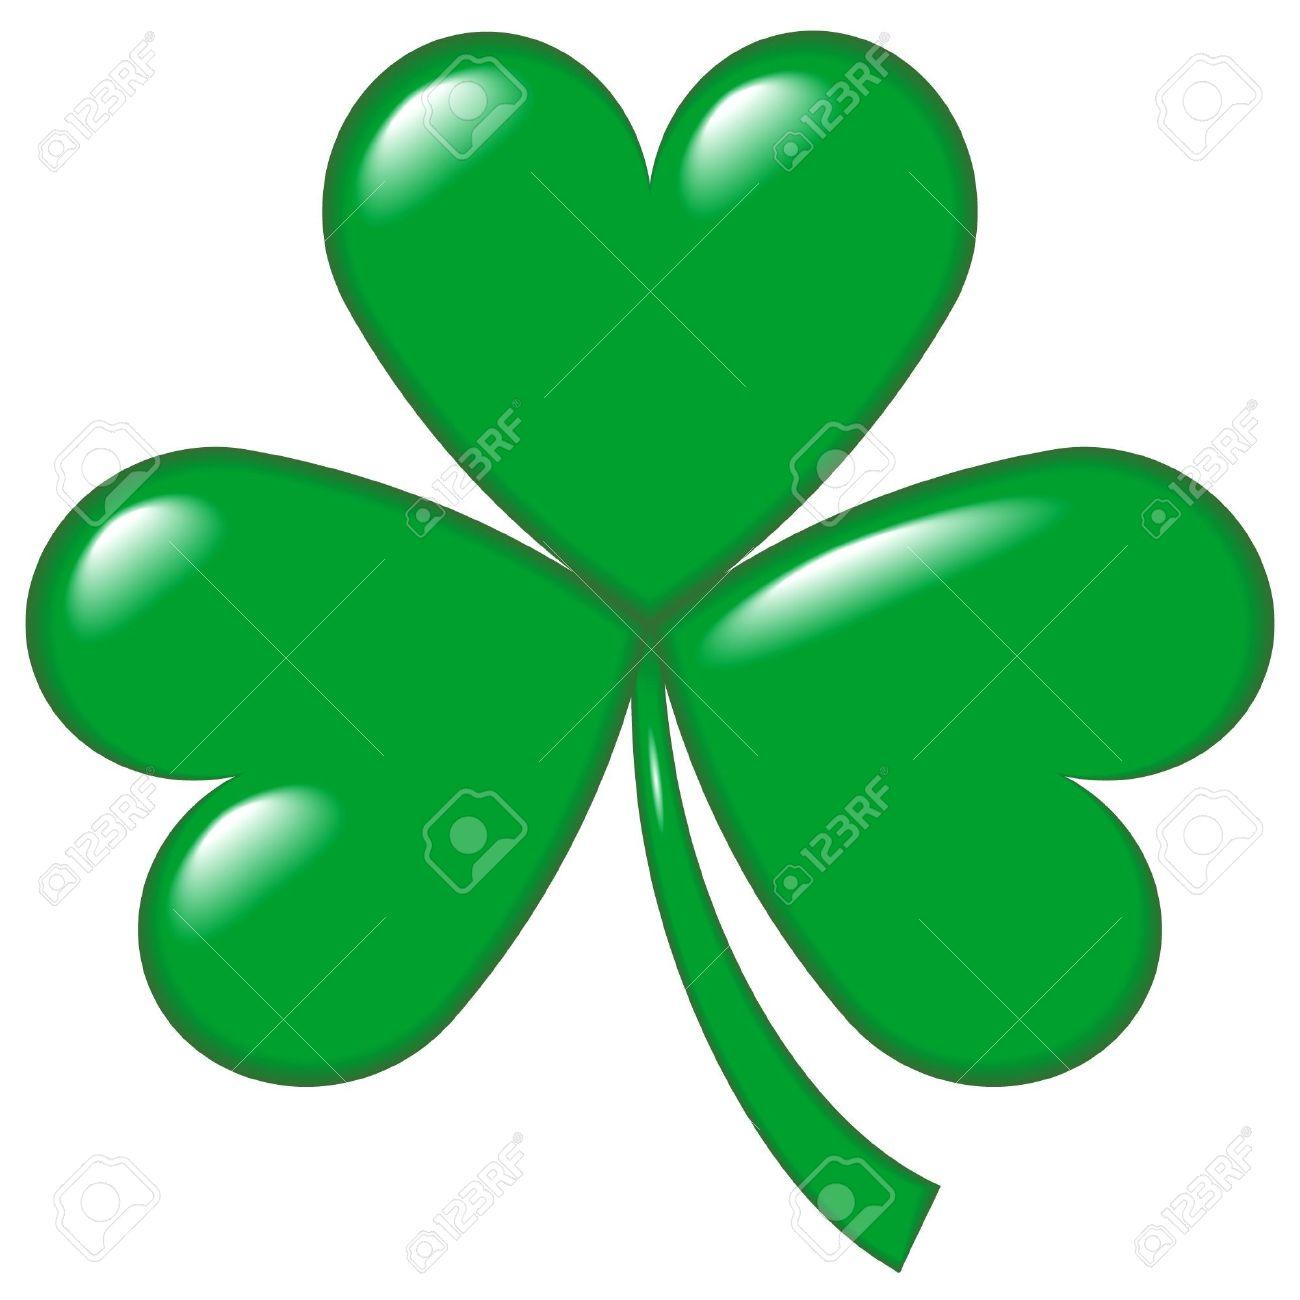 An illustration of a shamrock or hop clover symbol of ireland an illustration of a shamrock or hop clover symbol of ireland and of st biocorpaavc Gallery